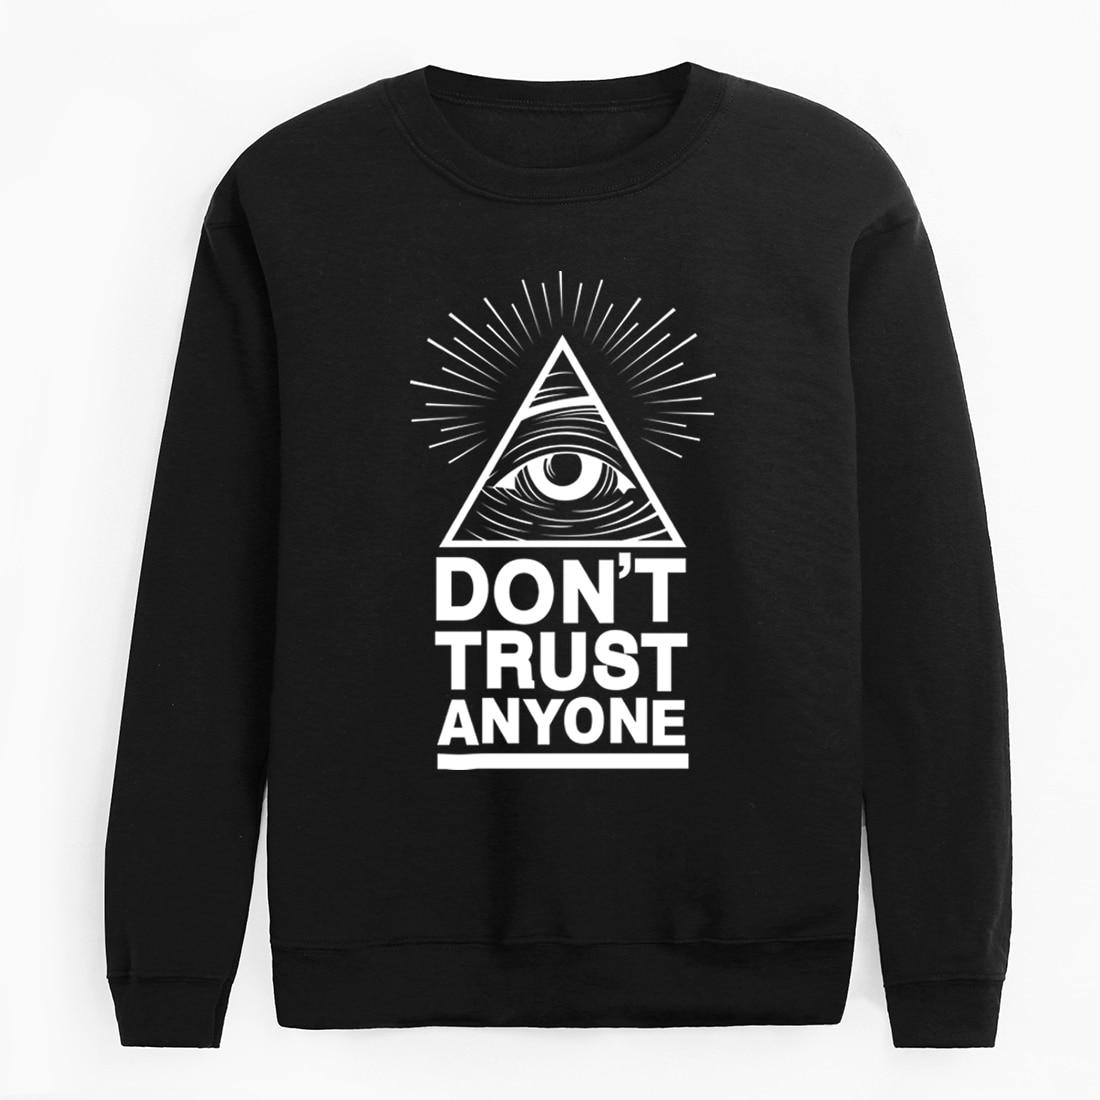 2020 New Harajuku Clothing Man Dont Trust Anyone Autumn Winter Fleece Hoodies Illuminati All Seeing Eye Sweatshirt Men Pullovers